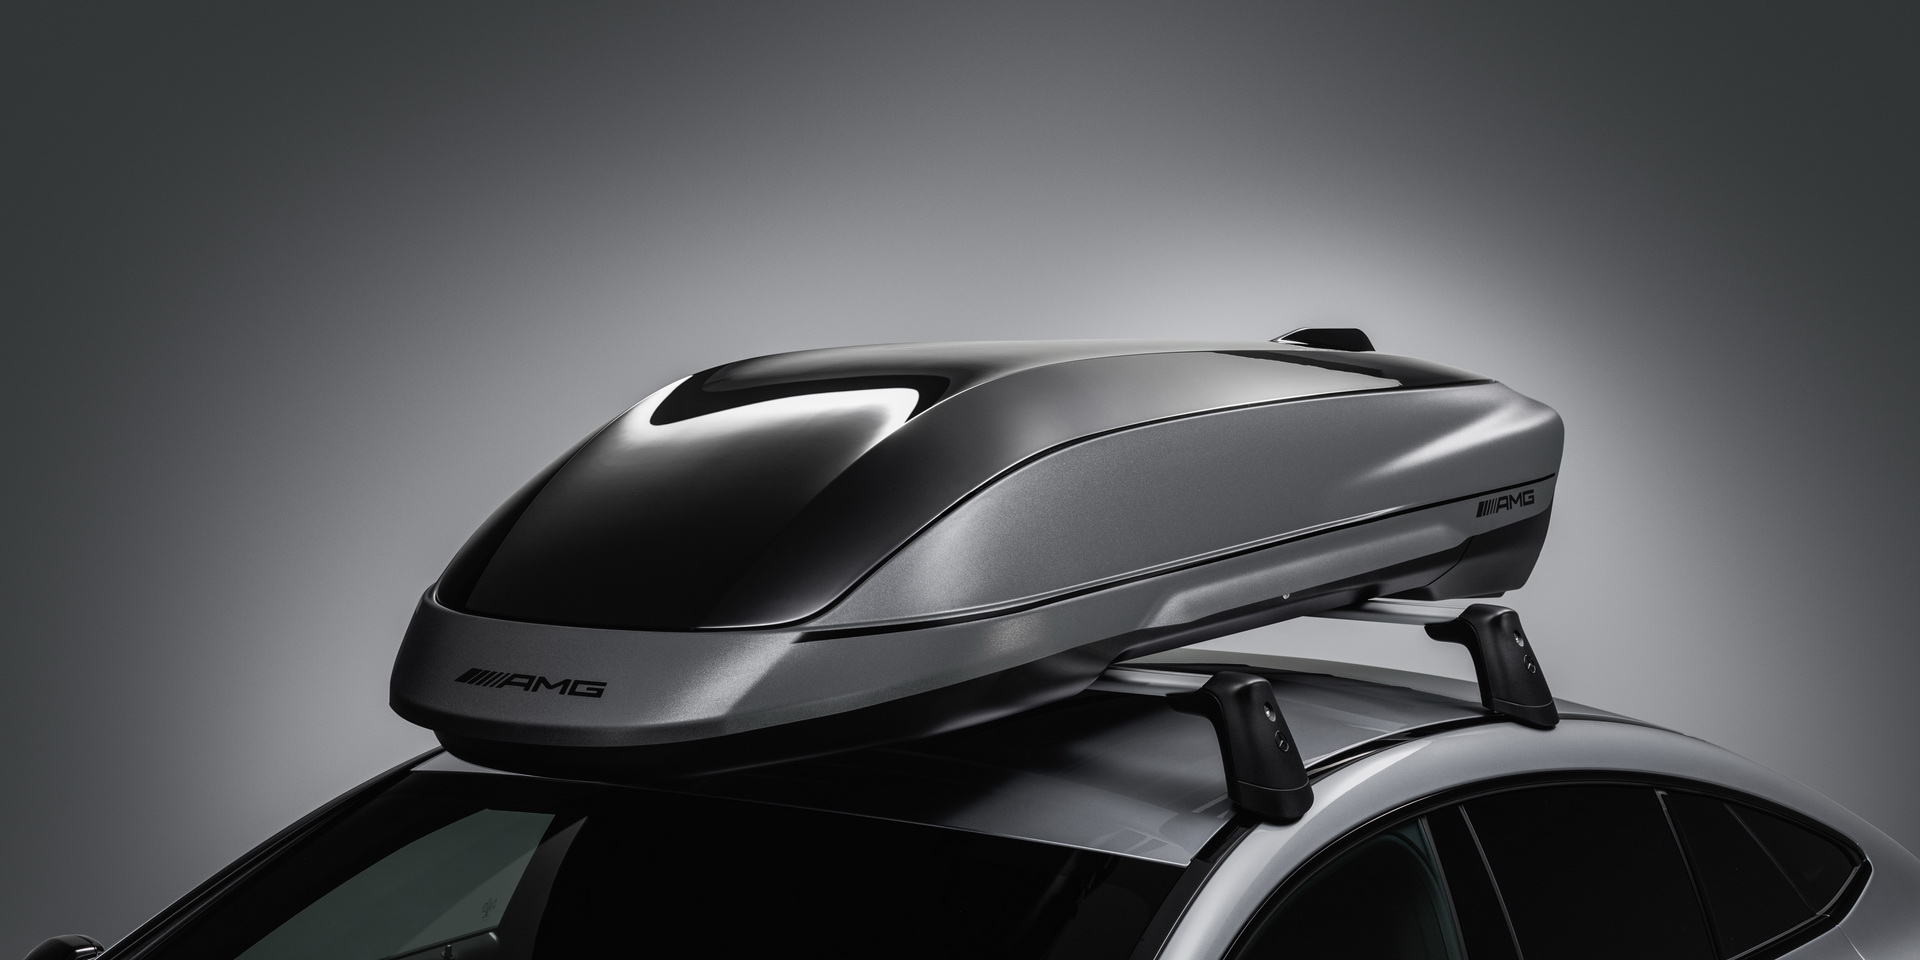 M-Benz AMG推出原廠車頂箱,增加410公升置物容積